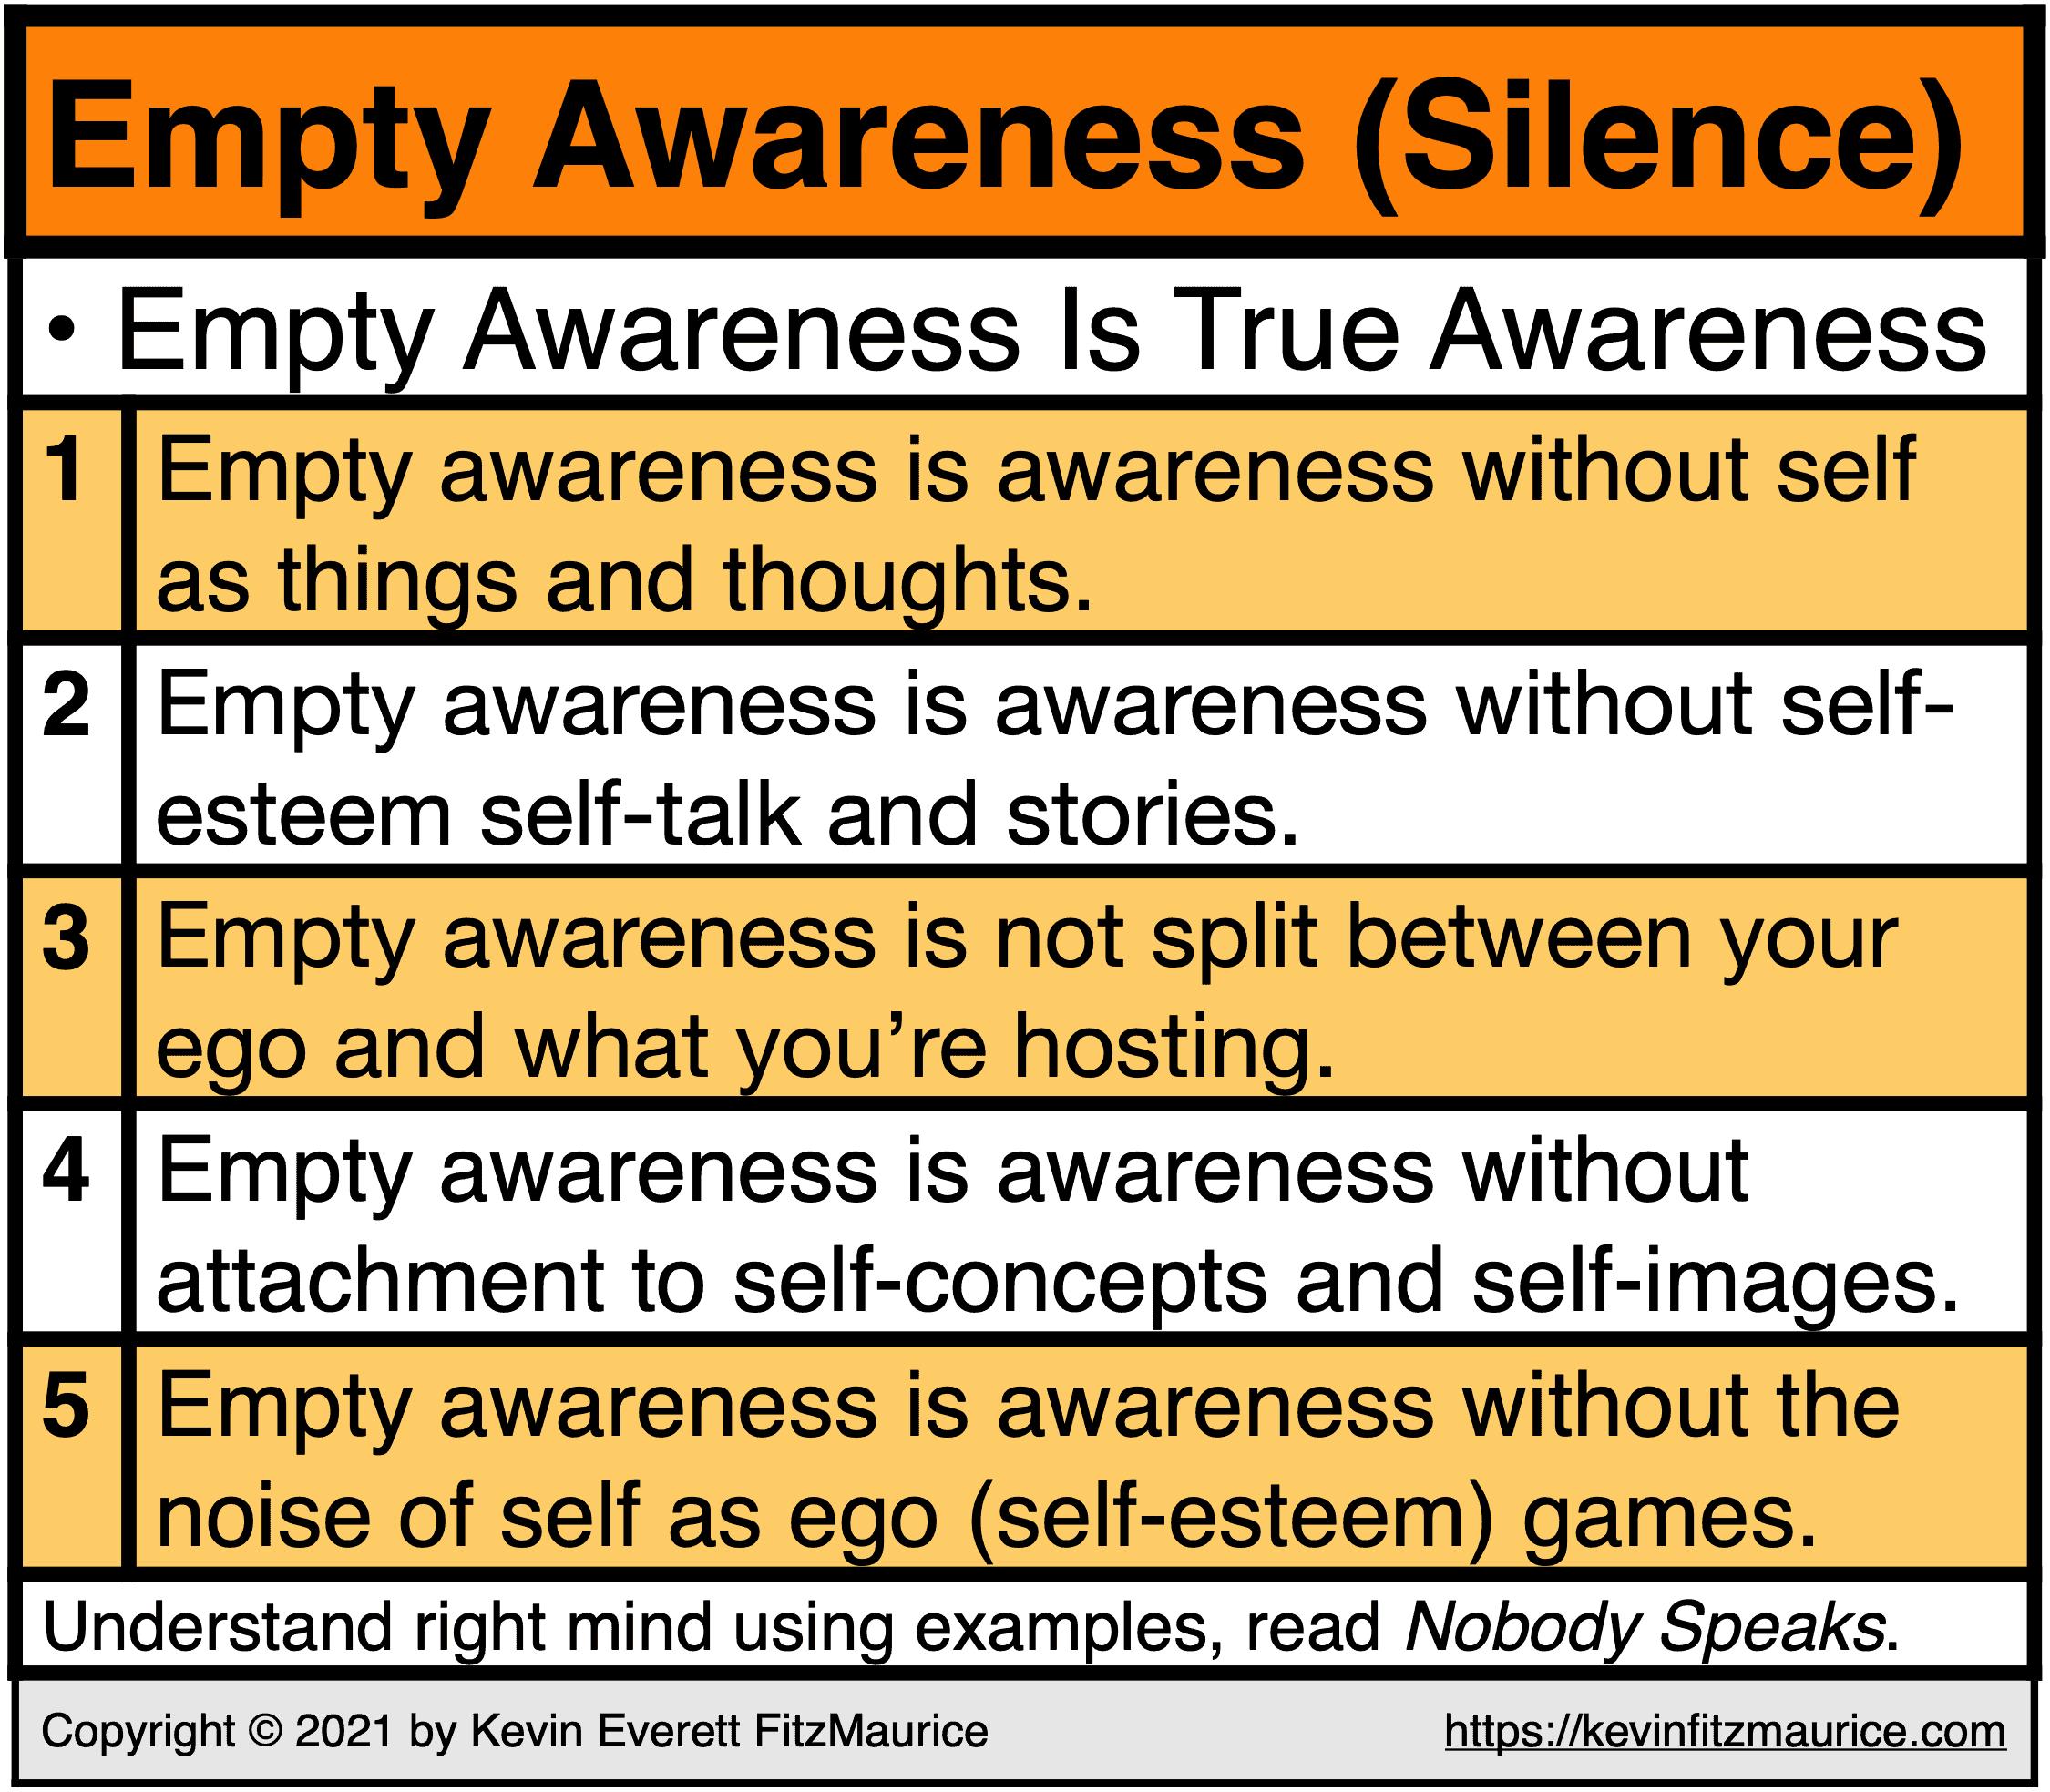 Empty Awareness (Silence)